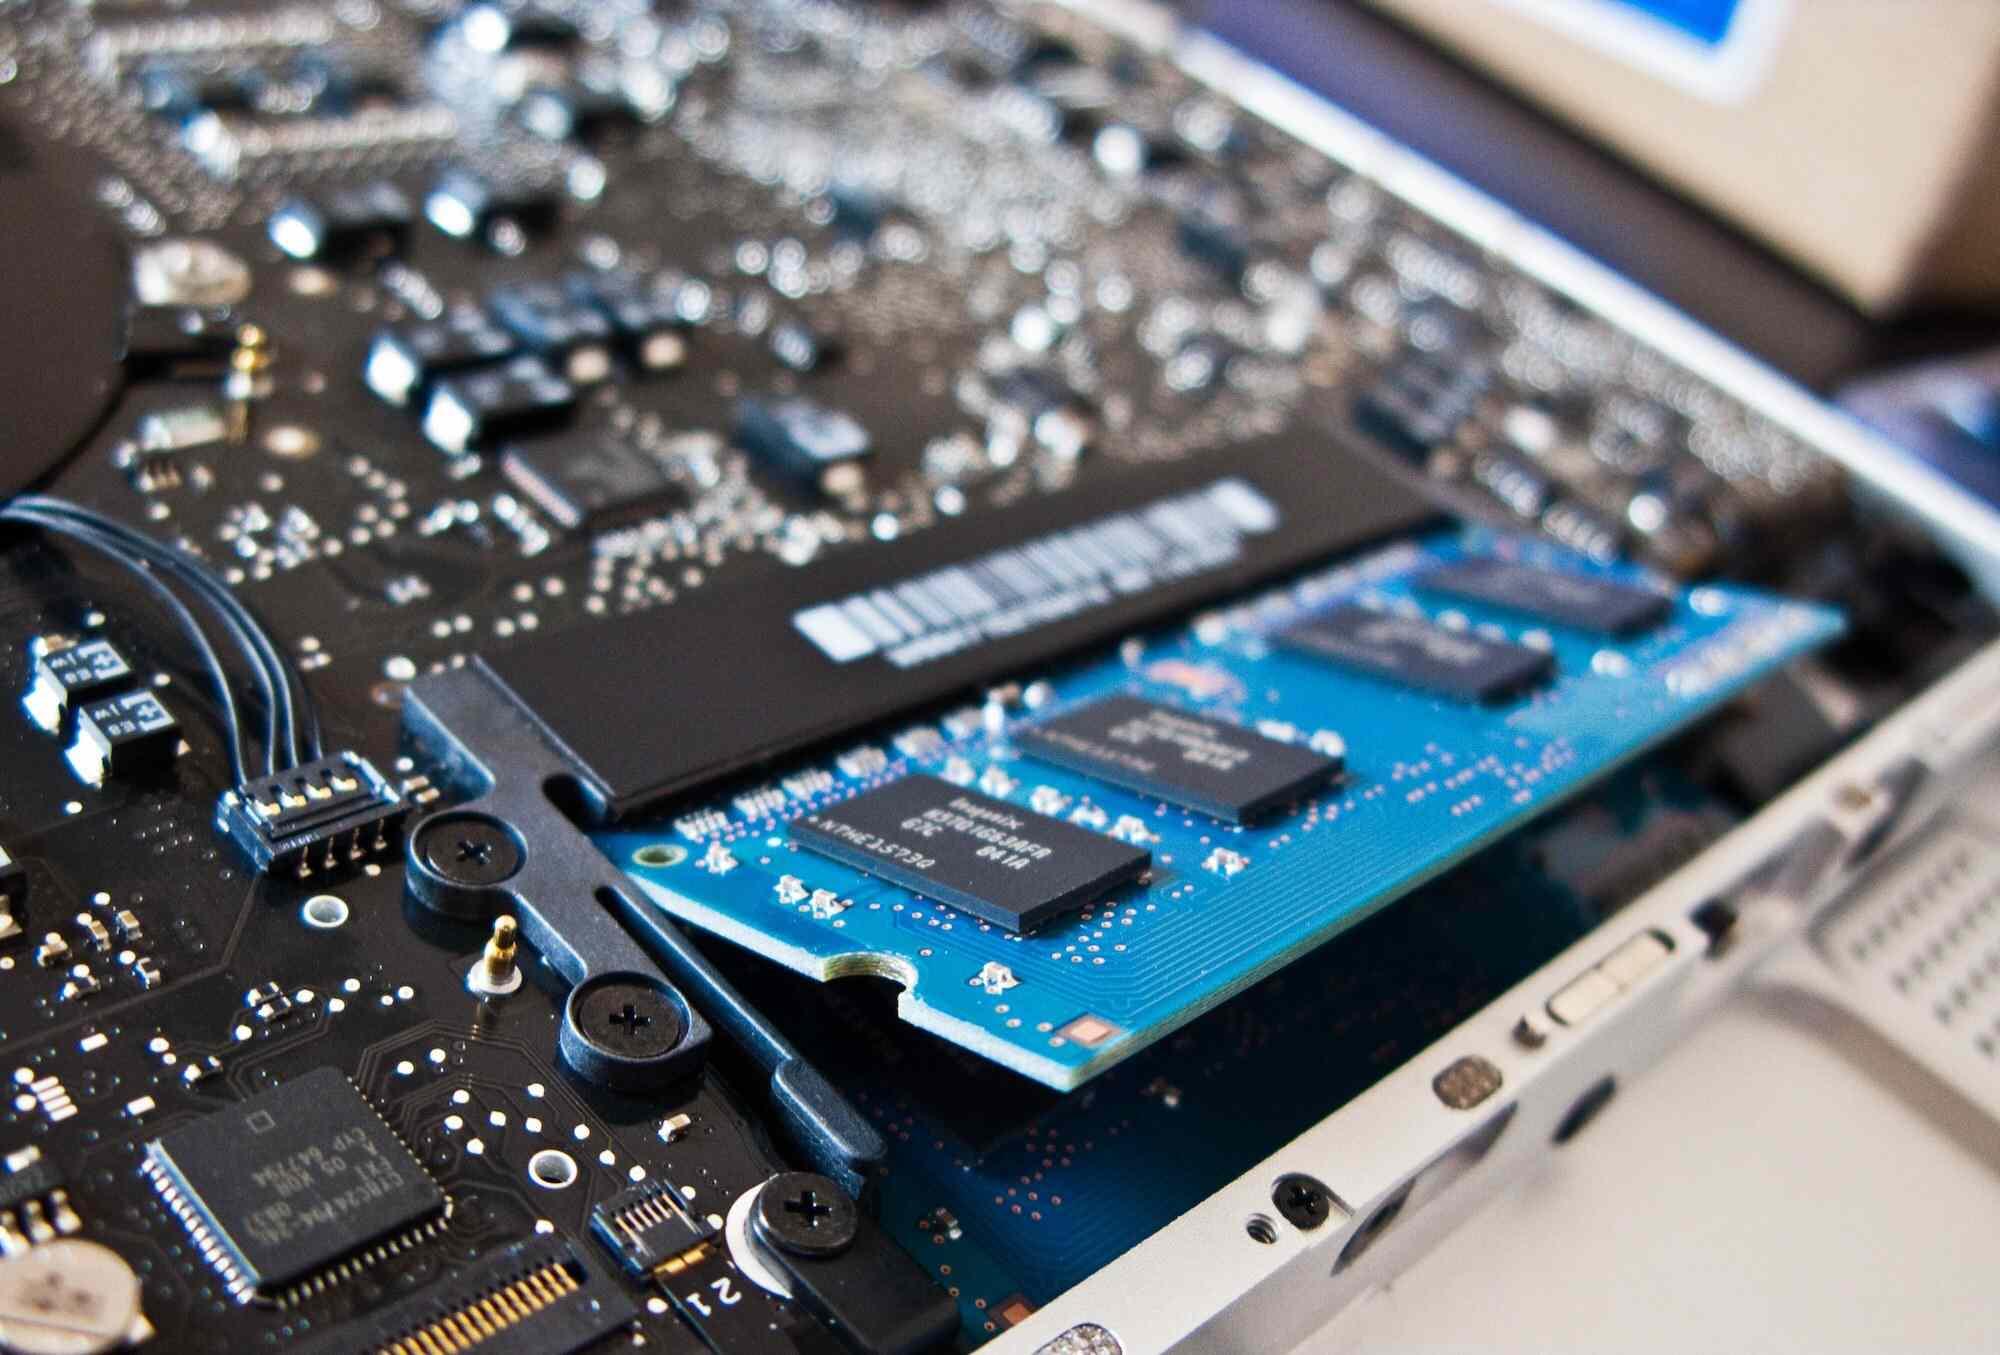 Interior look at a circuit board